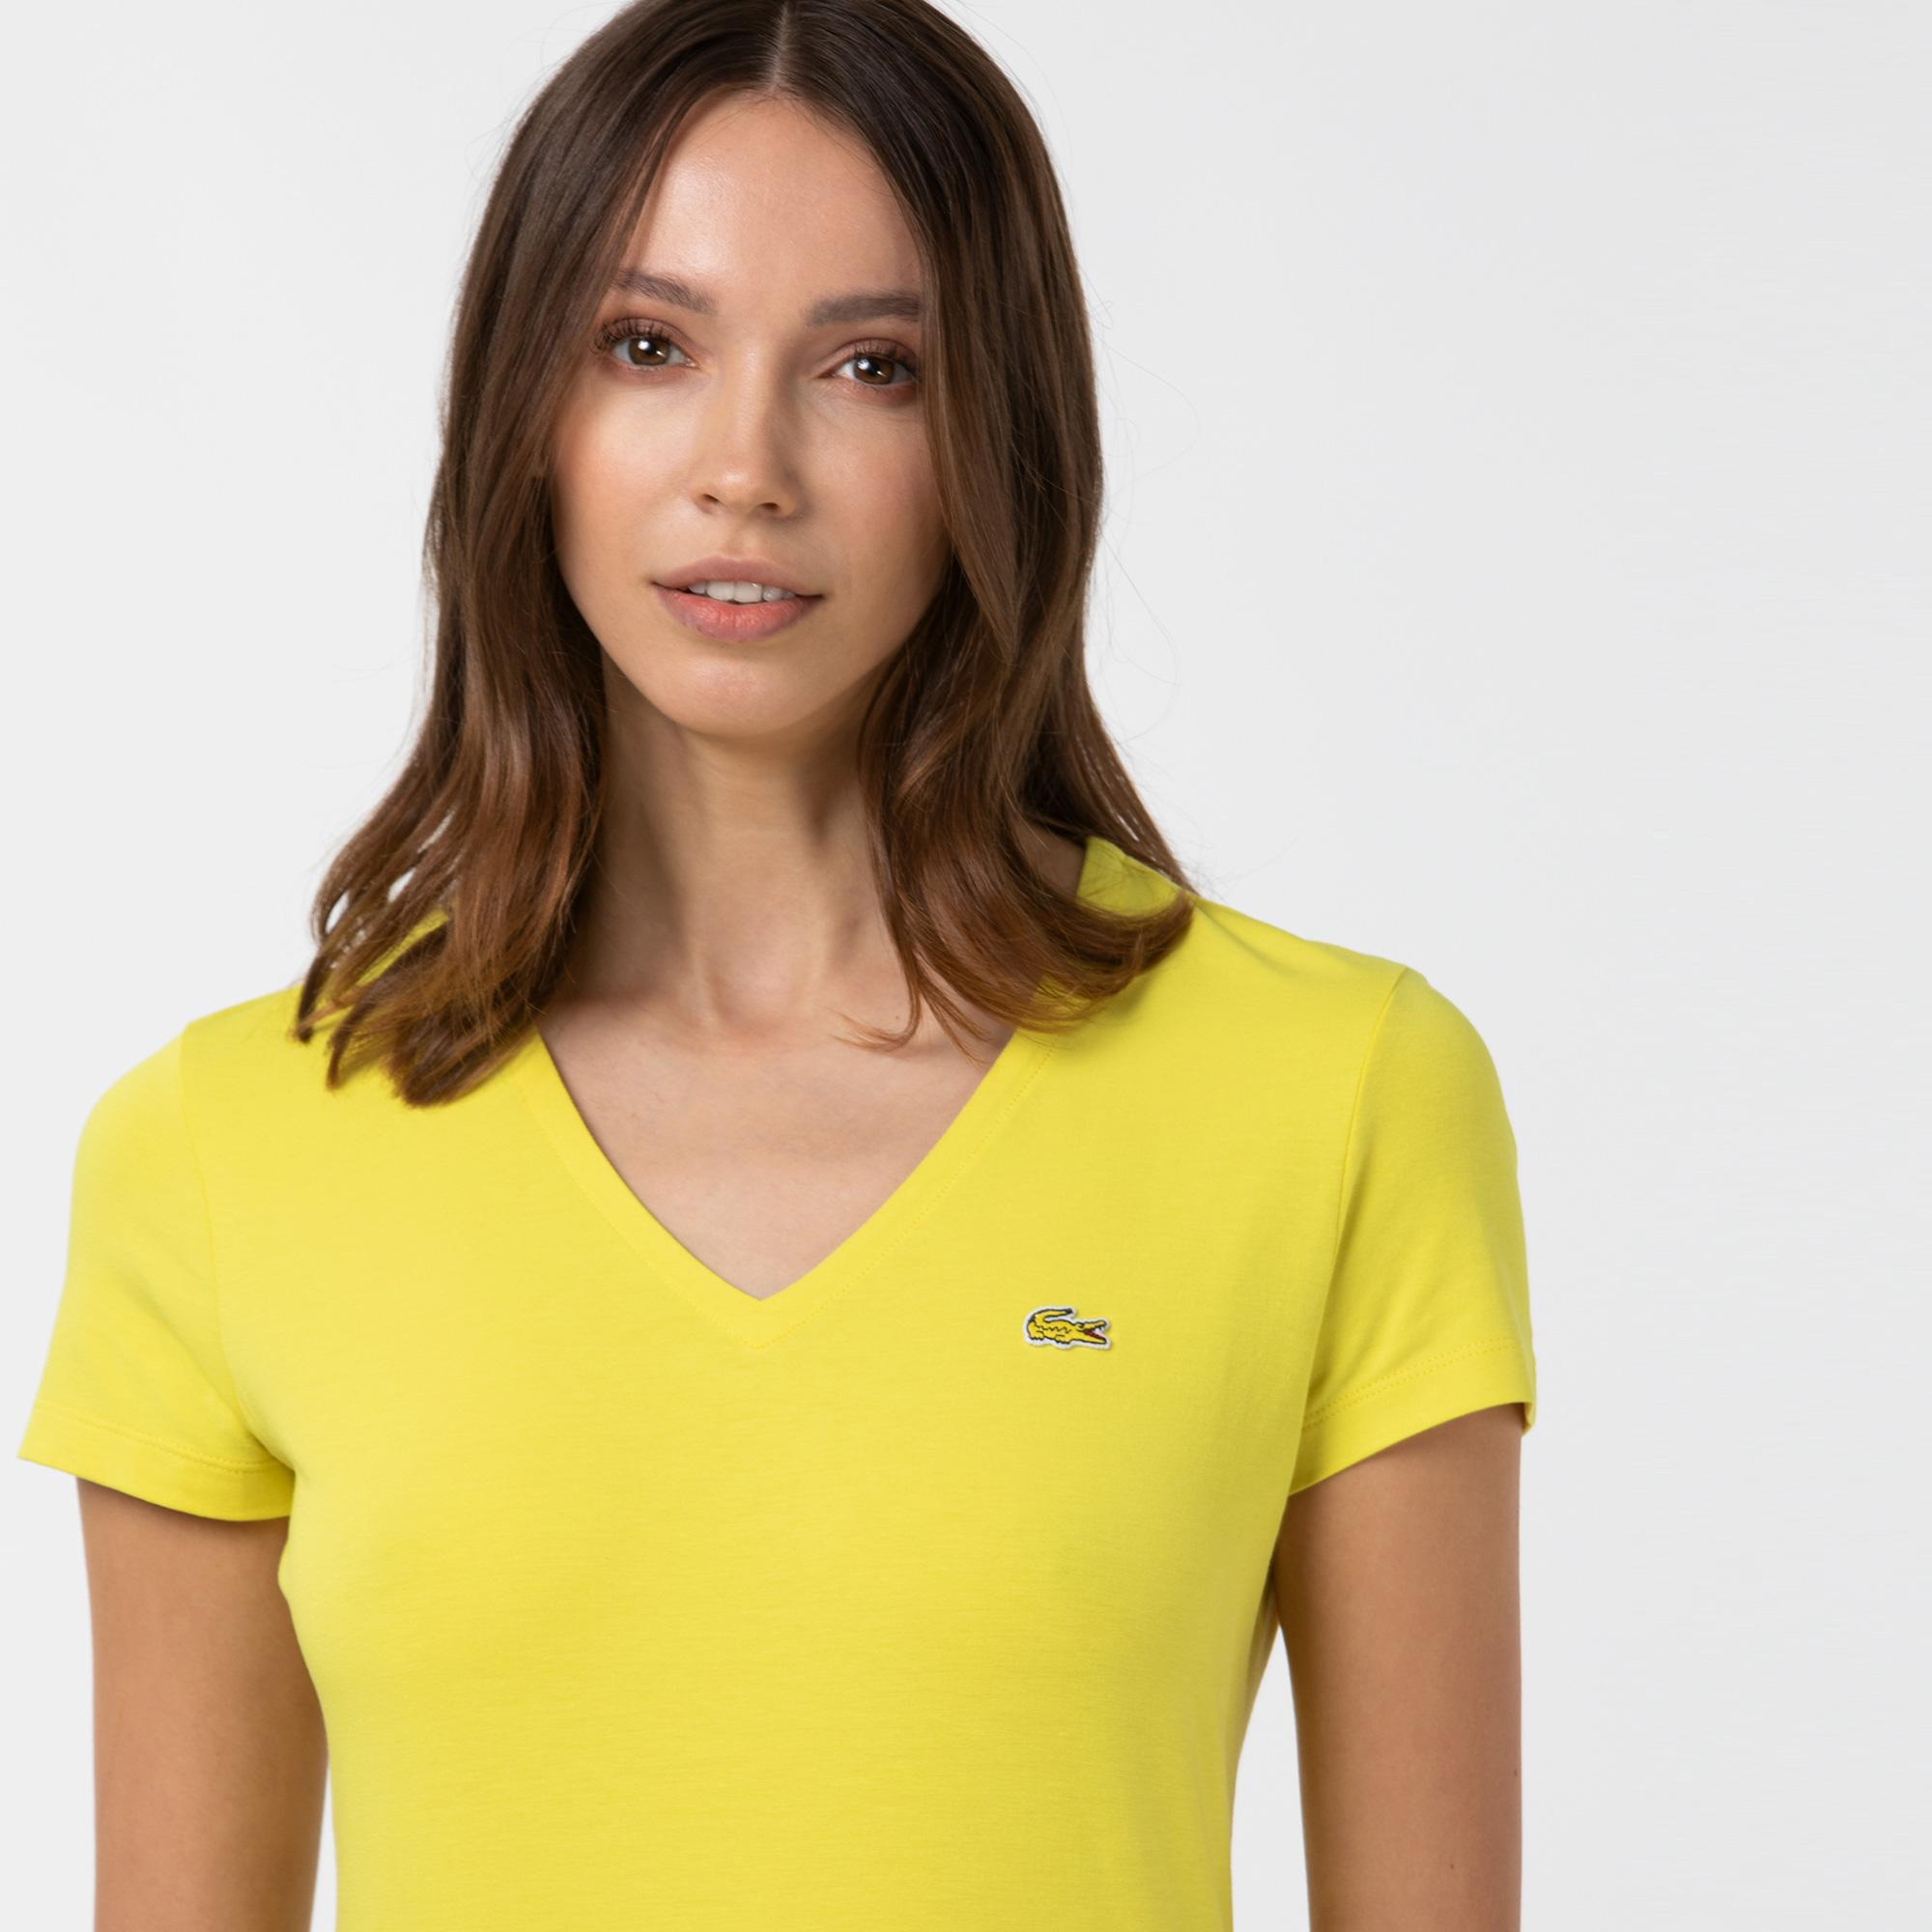 Lacoste Kadın V Yaka Sarı T-Shirt